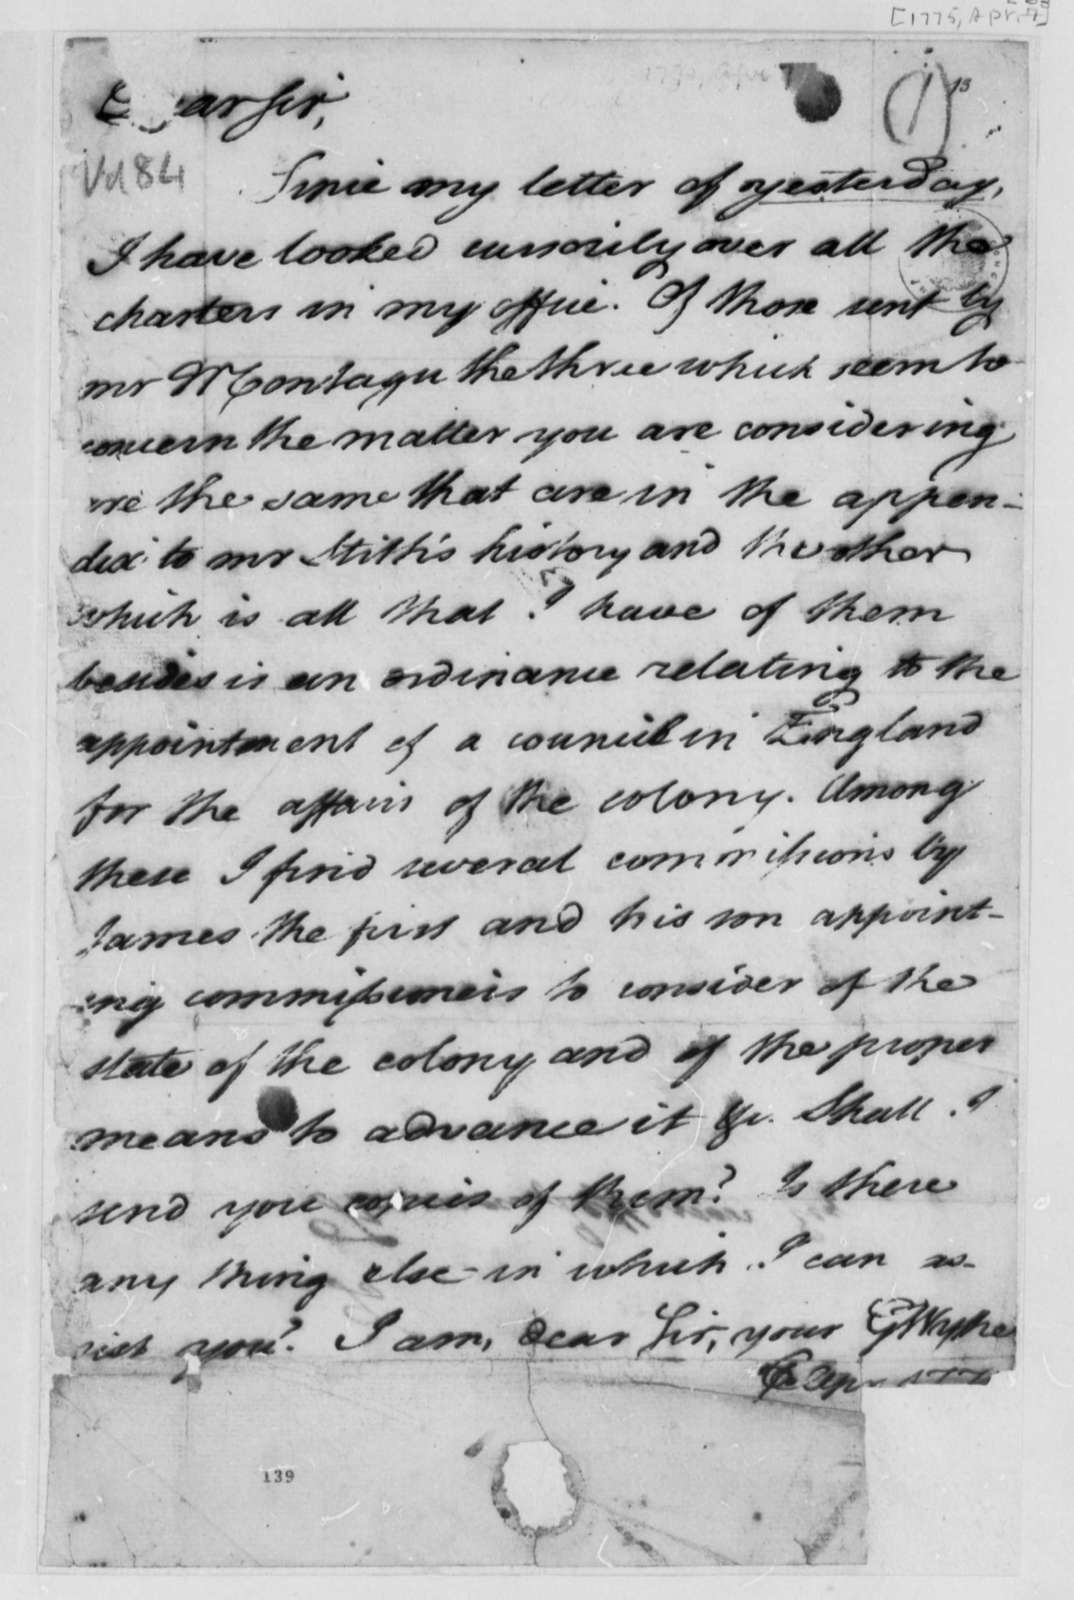 George Wythe to Thomas Jefferson, April 6, 1775, Records of Virginia Land Grants